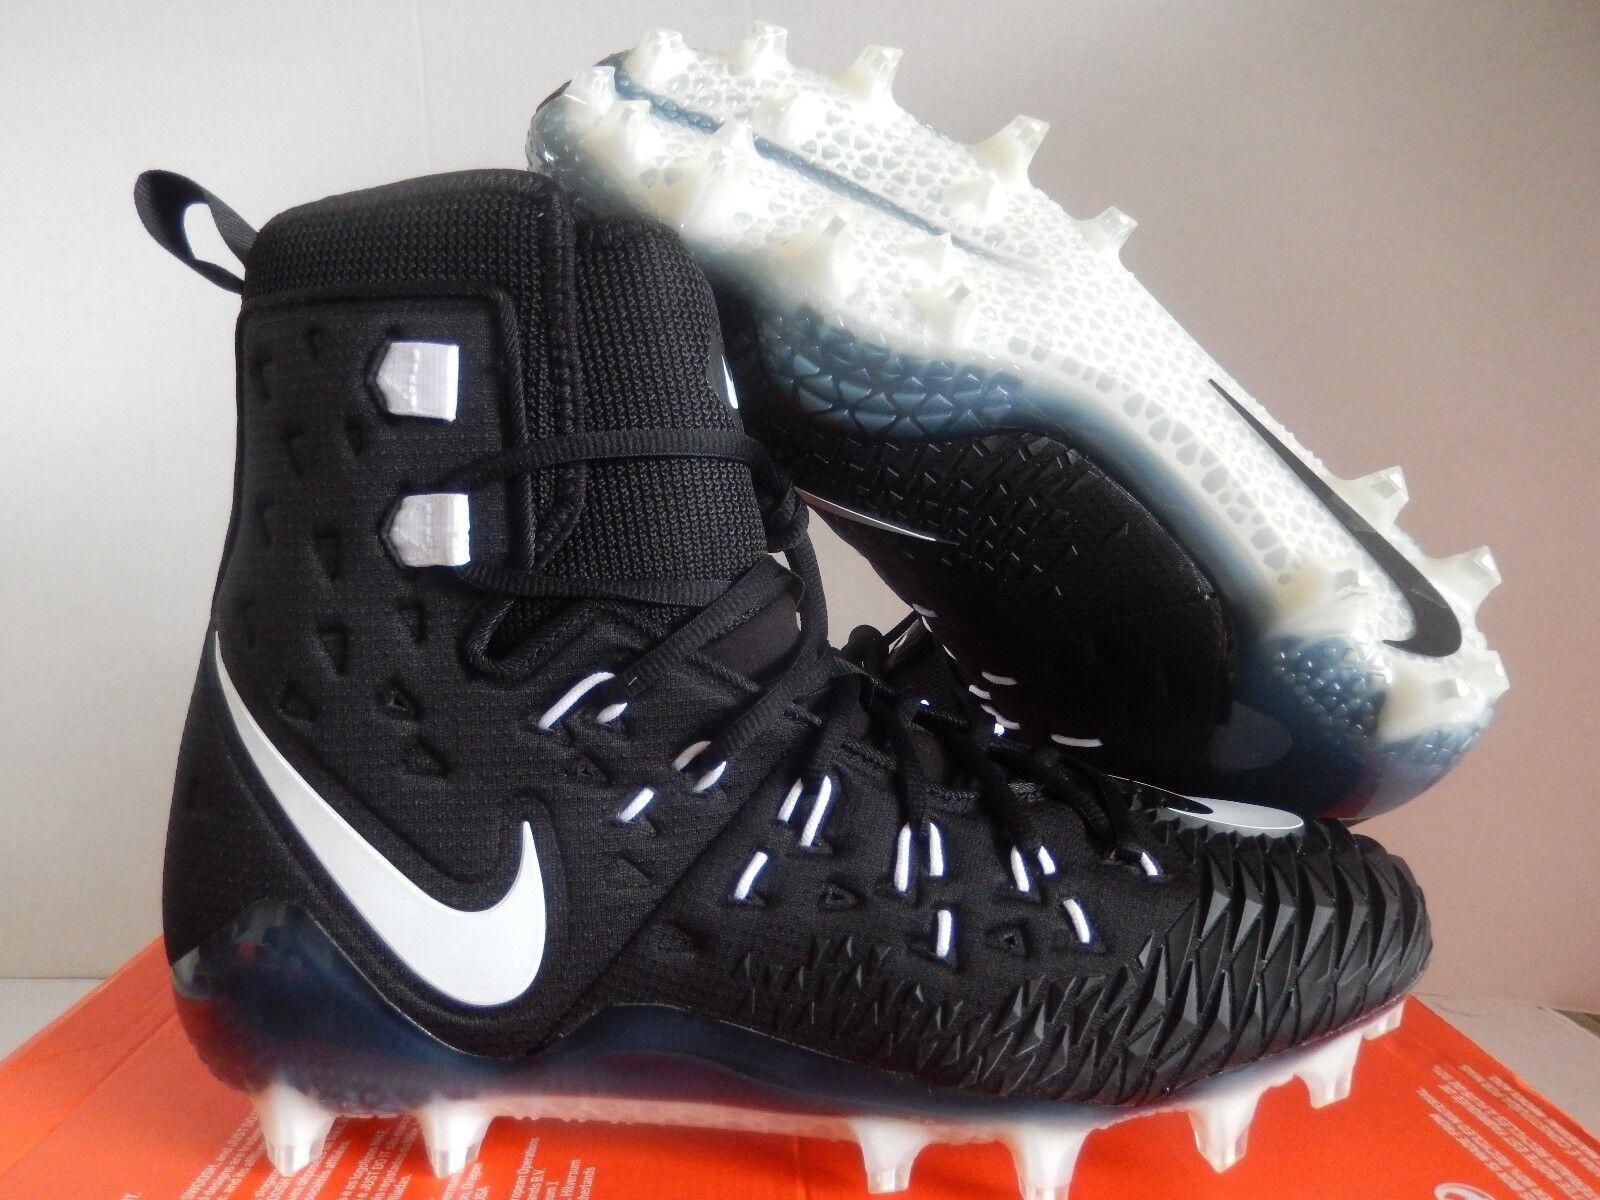 Nike Fuerza Salvaje Elite TD fútbol tacos Negro- [857063-011] blanco o- blanco o [857063-011] Negro- 7a116c